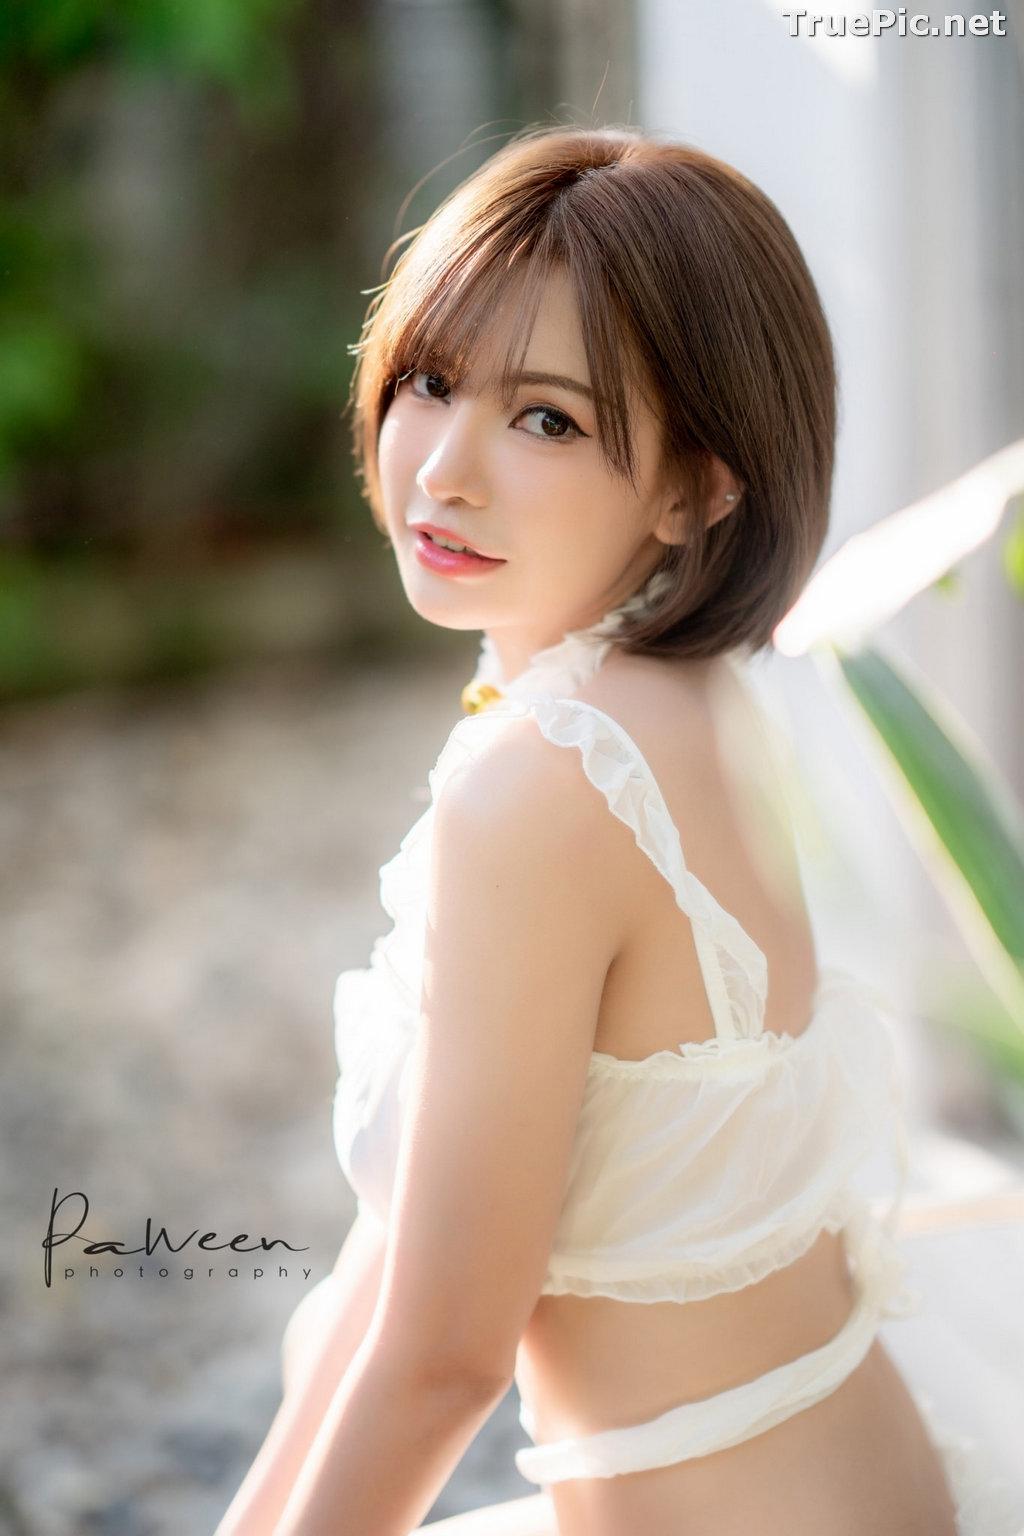 Image Thailand Model - Sutasinee Nokia Sirirak - White Sexy Bikini - TruePic.net - Picture-3